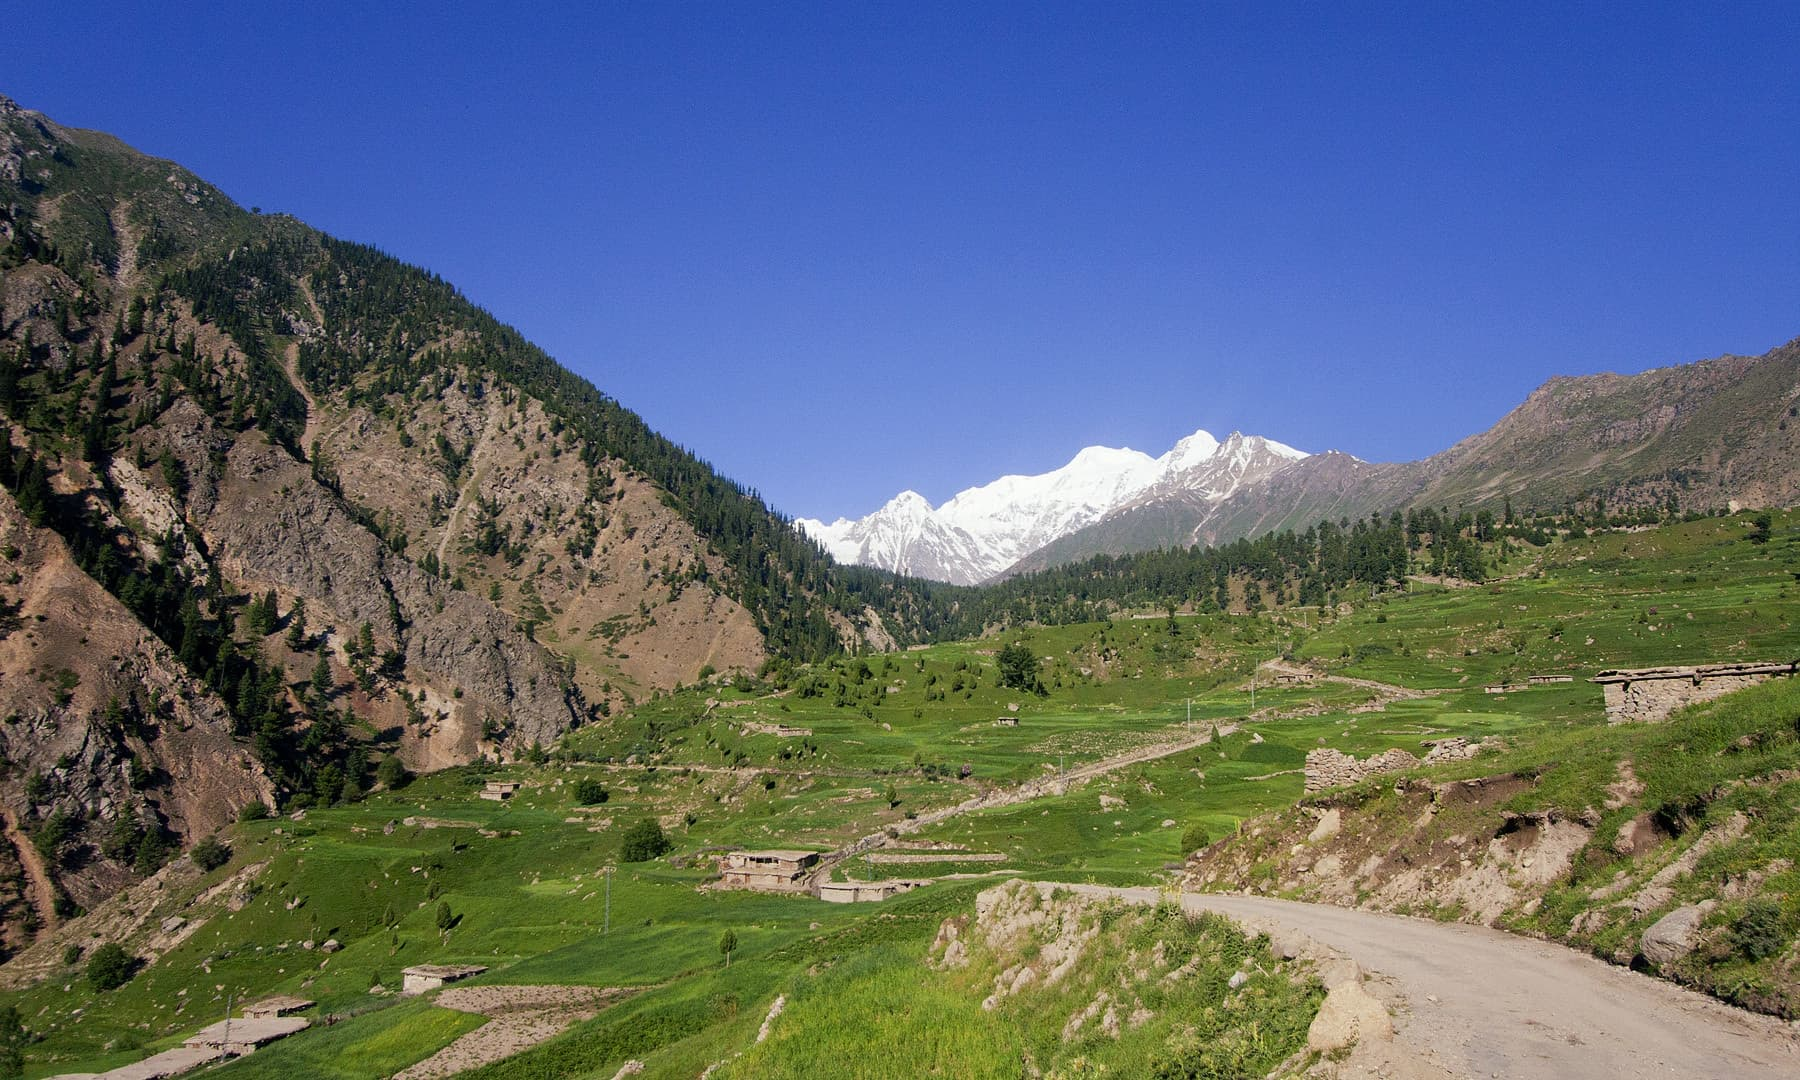 Rama village and Nangaparbat. — Syed Mehdi Bukhari